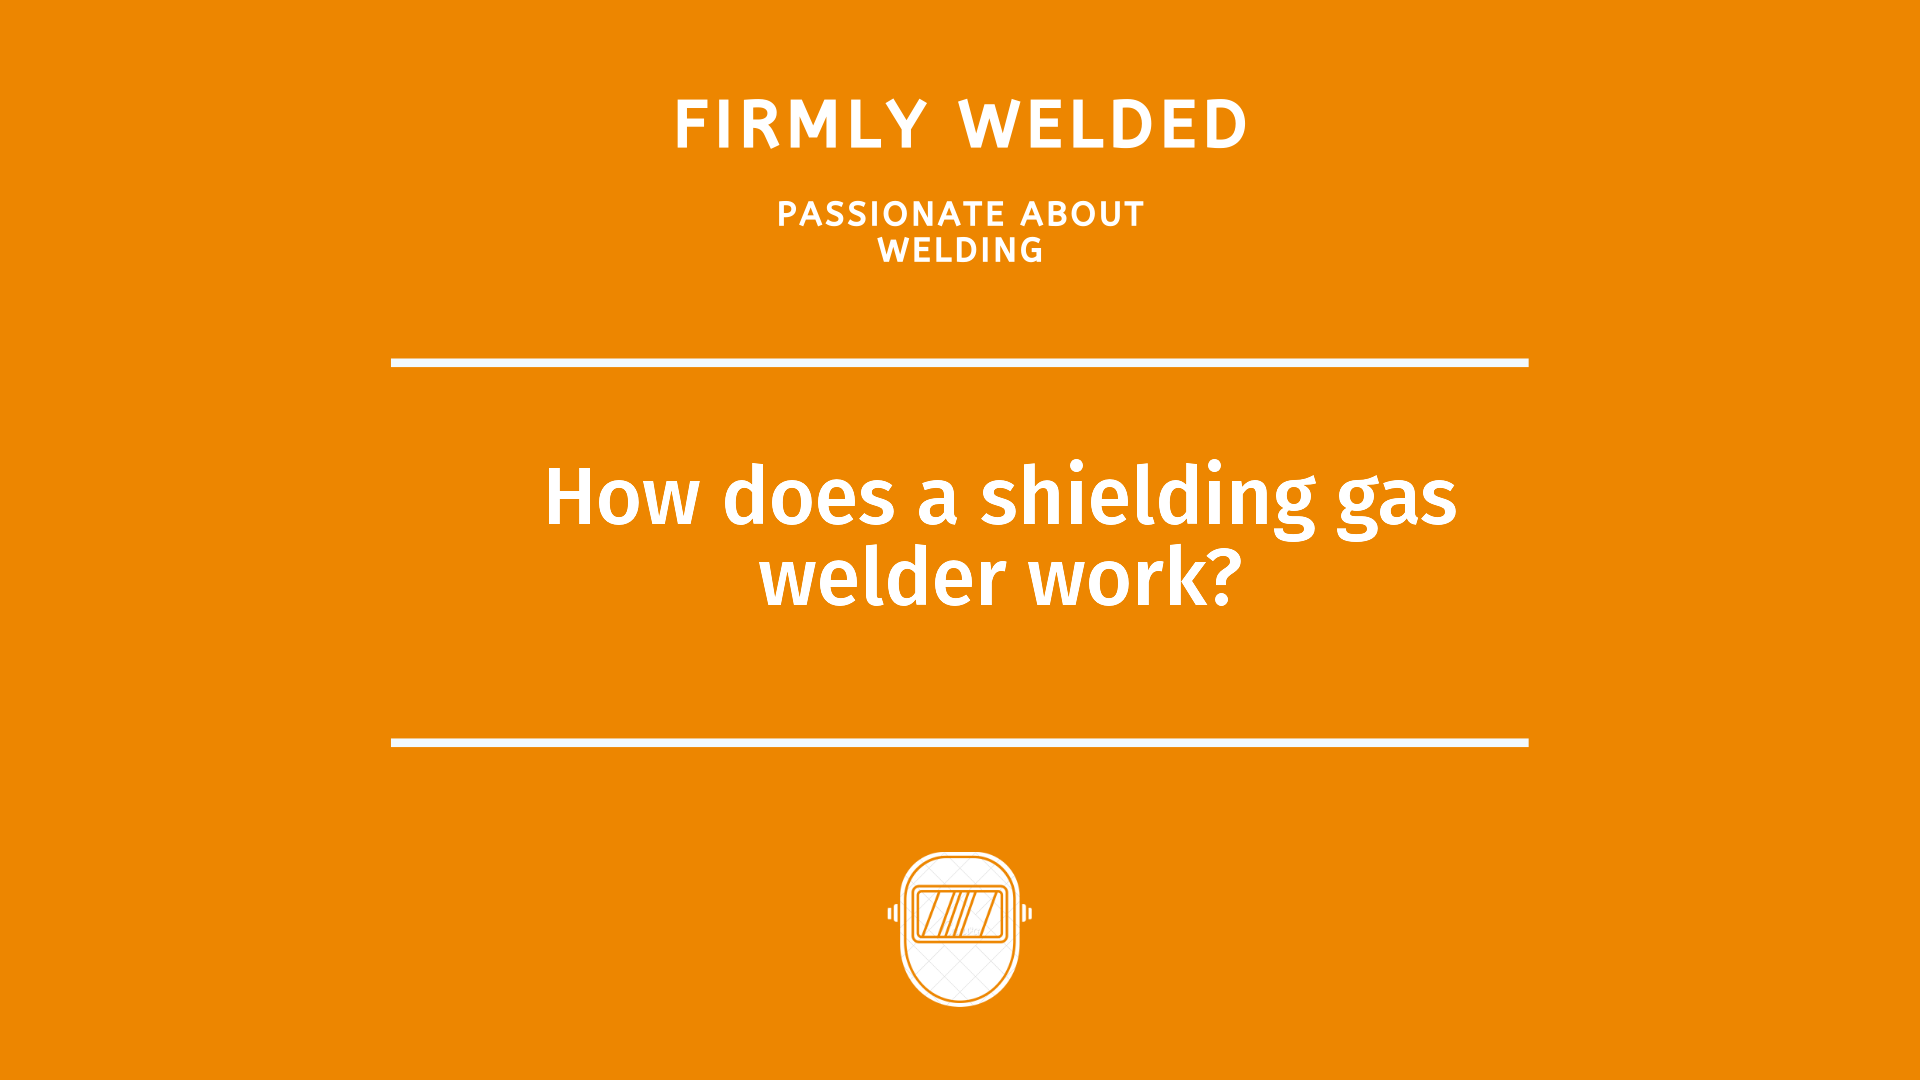 How does a shielding gas welder work?